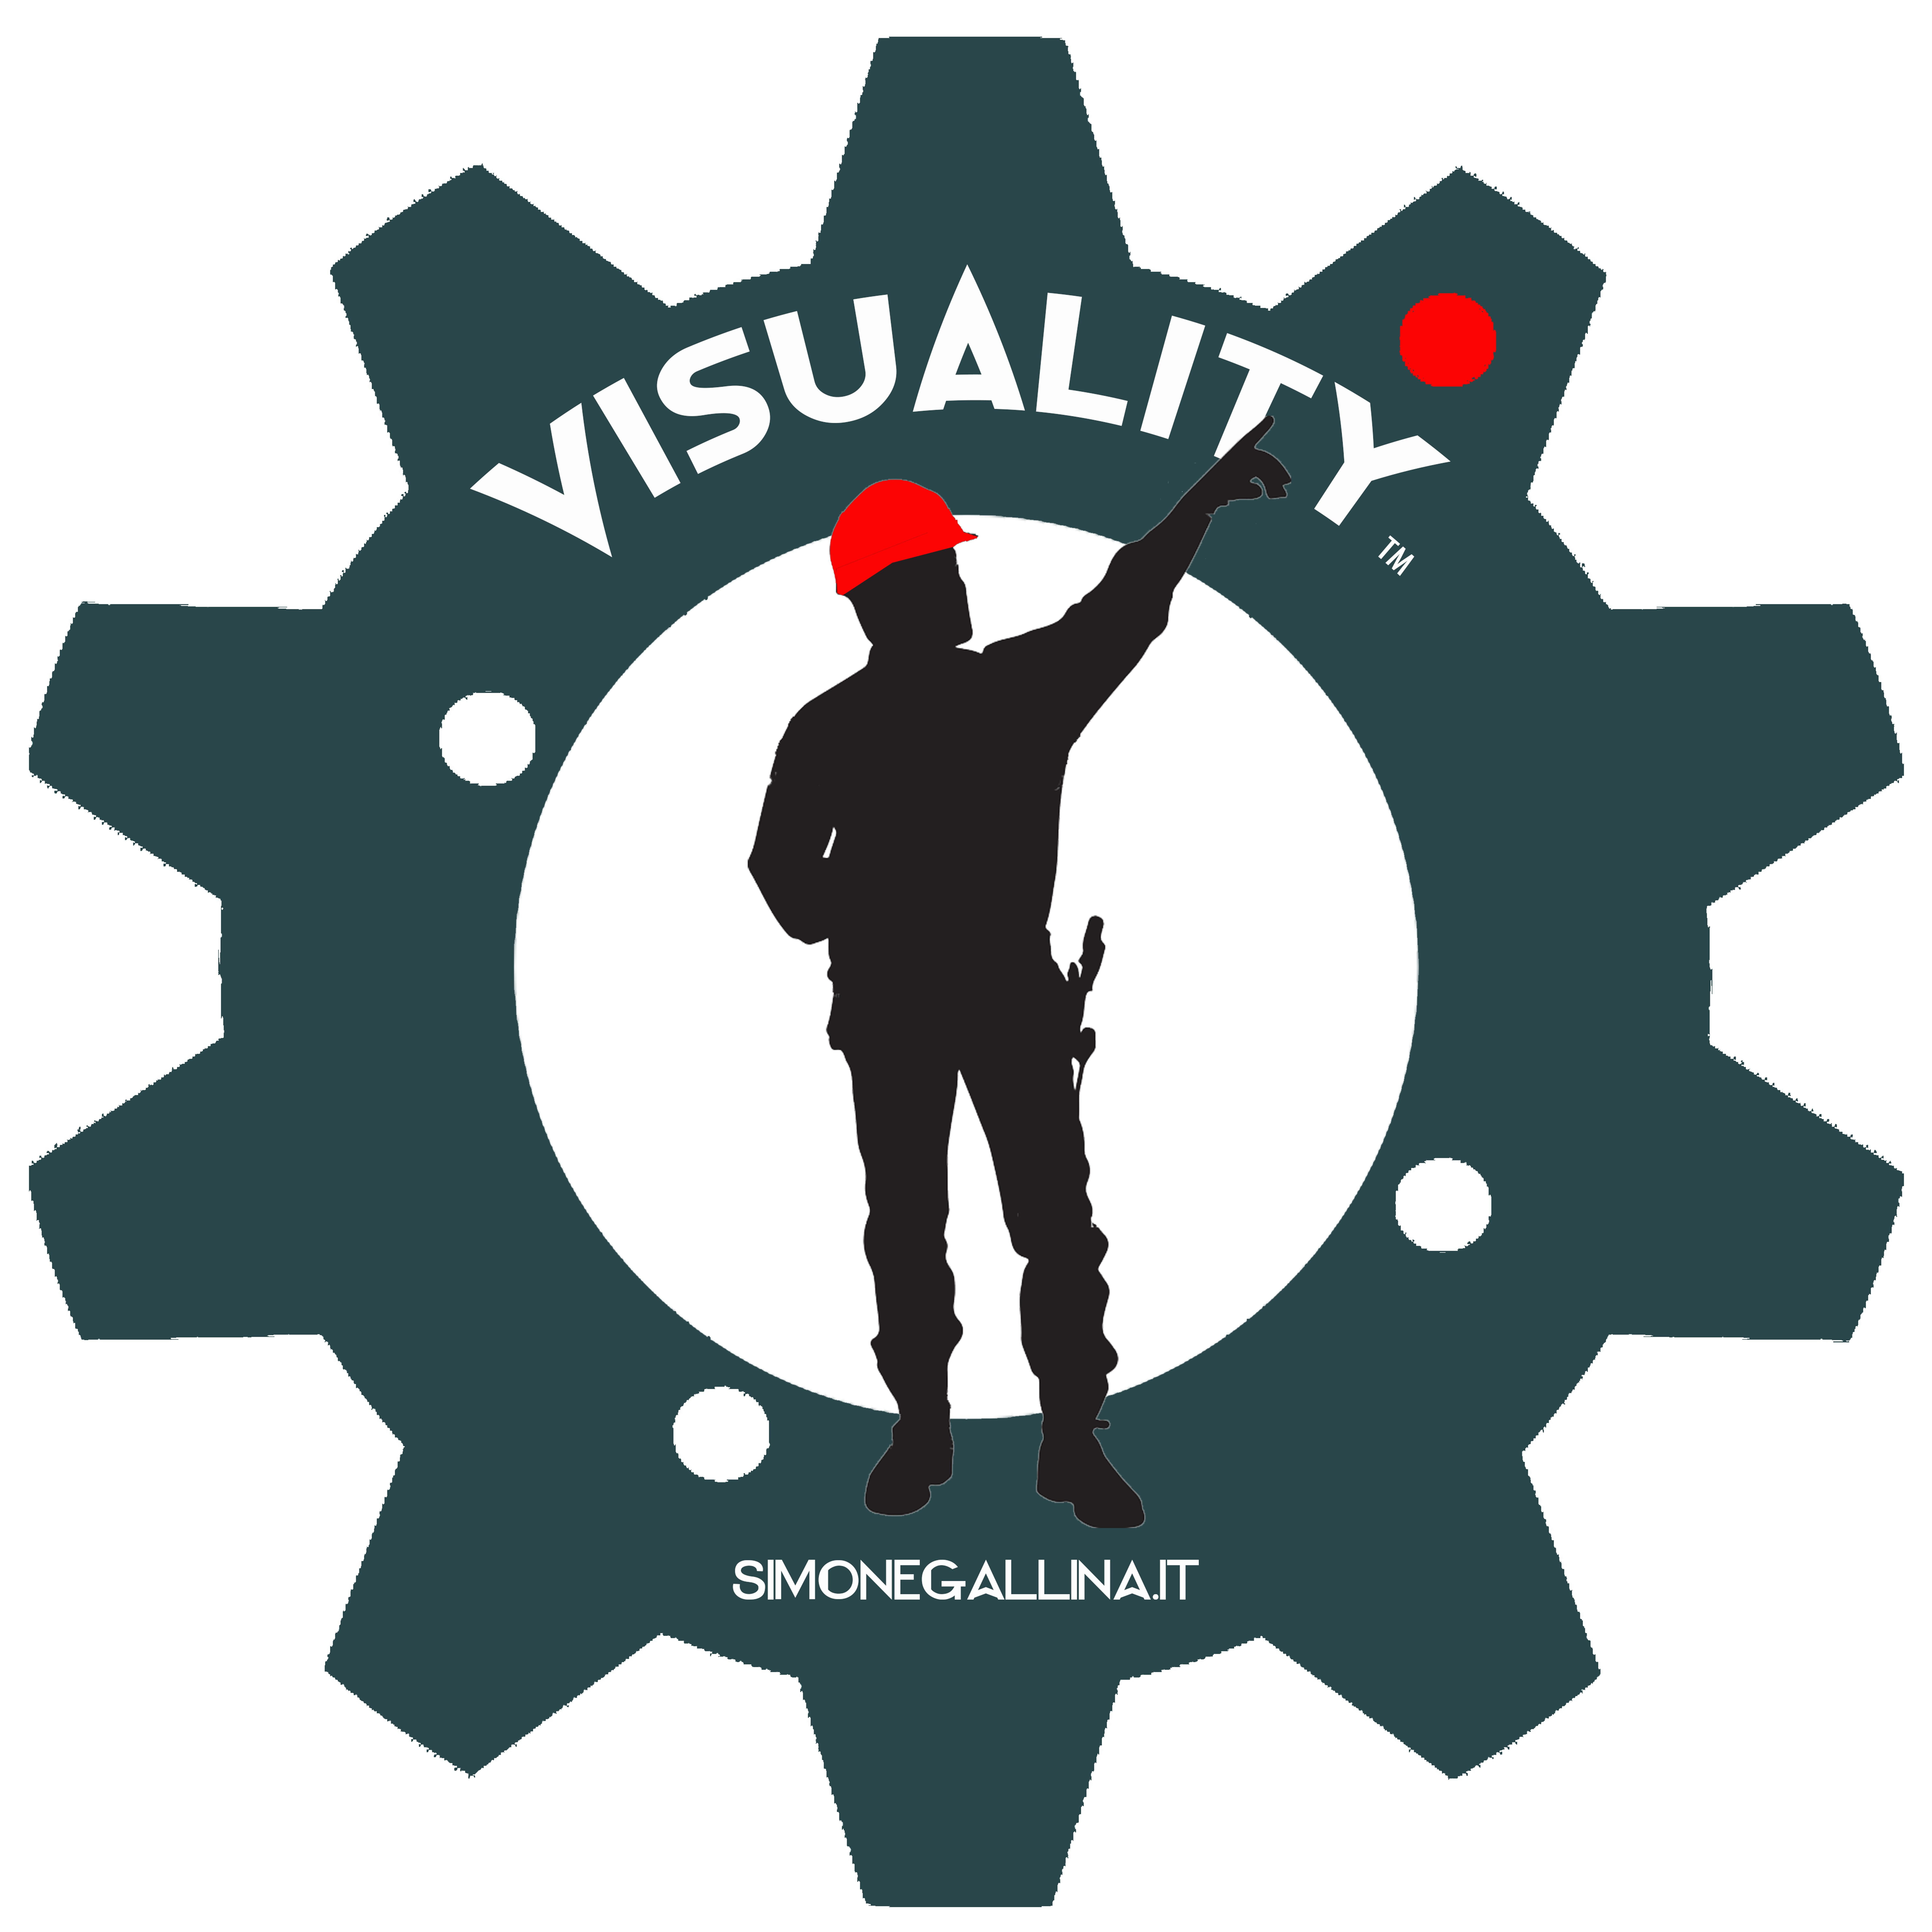 VISUALITY 20.20